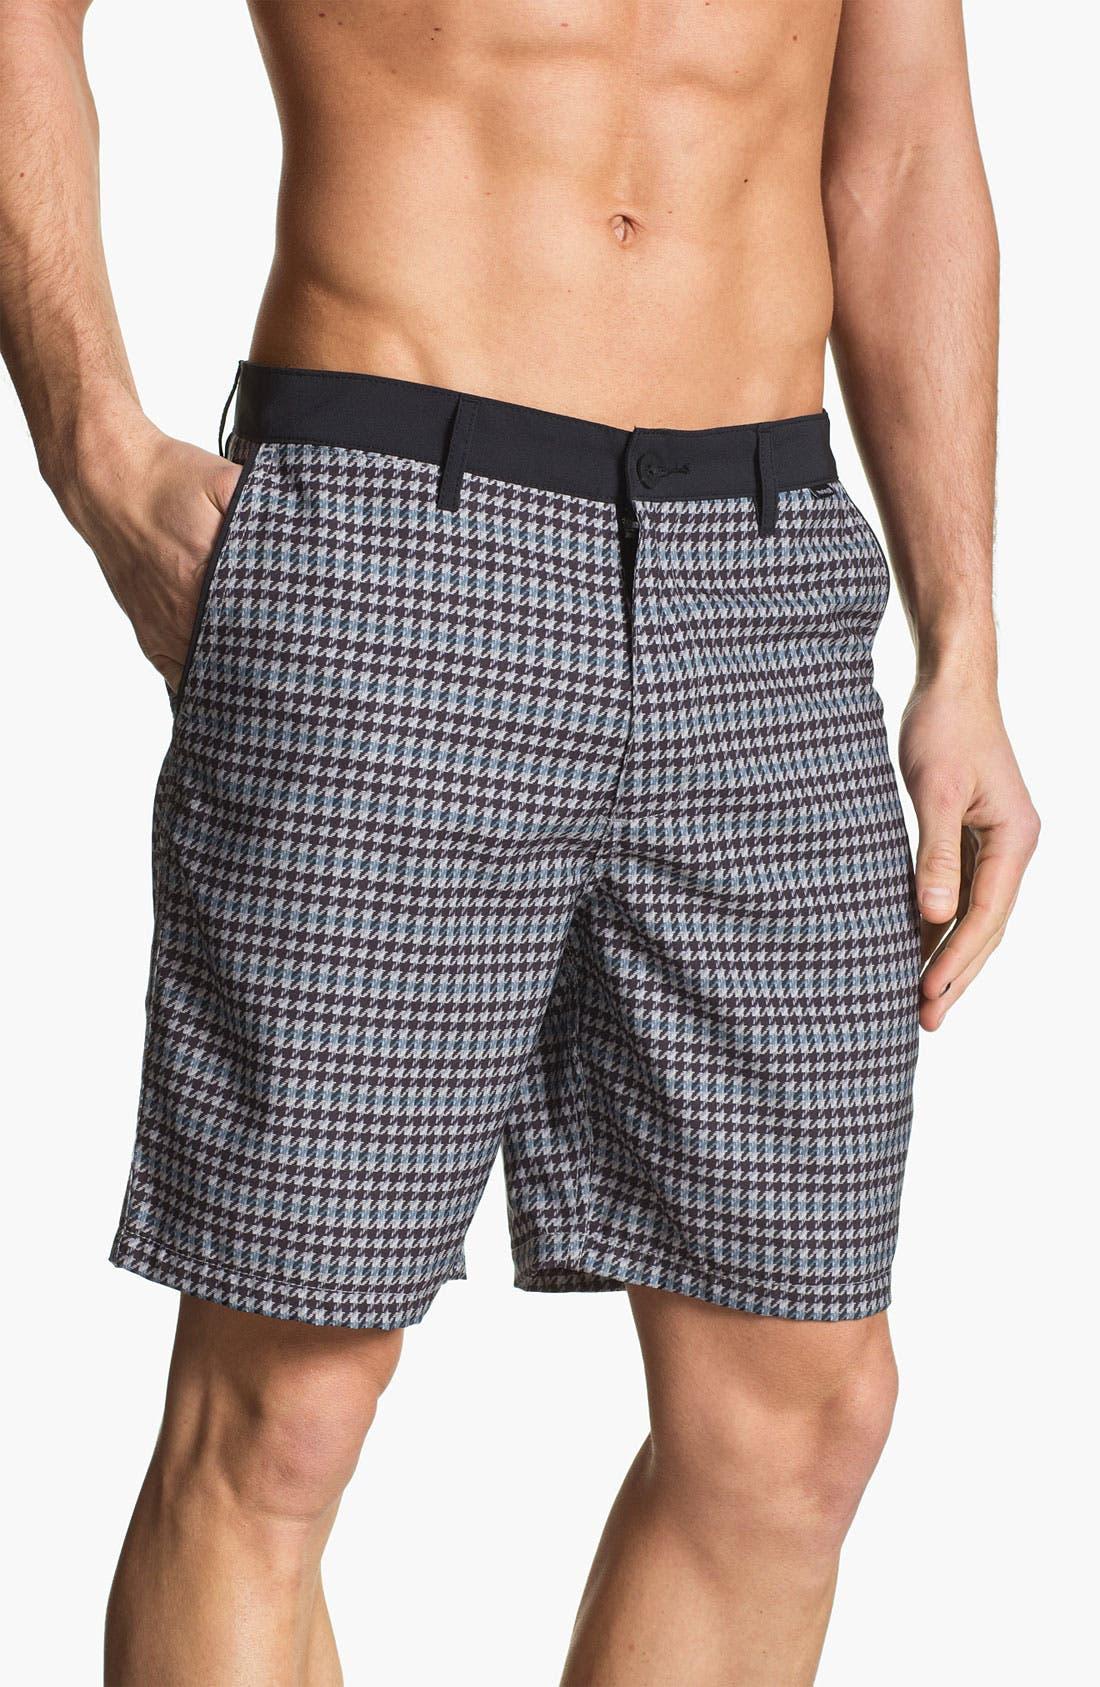 Alternate Image 1 Selected - Hurley 'Squad' Boardwalk Shorts